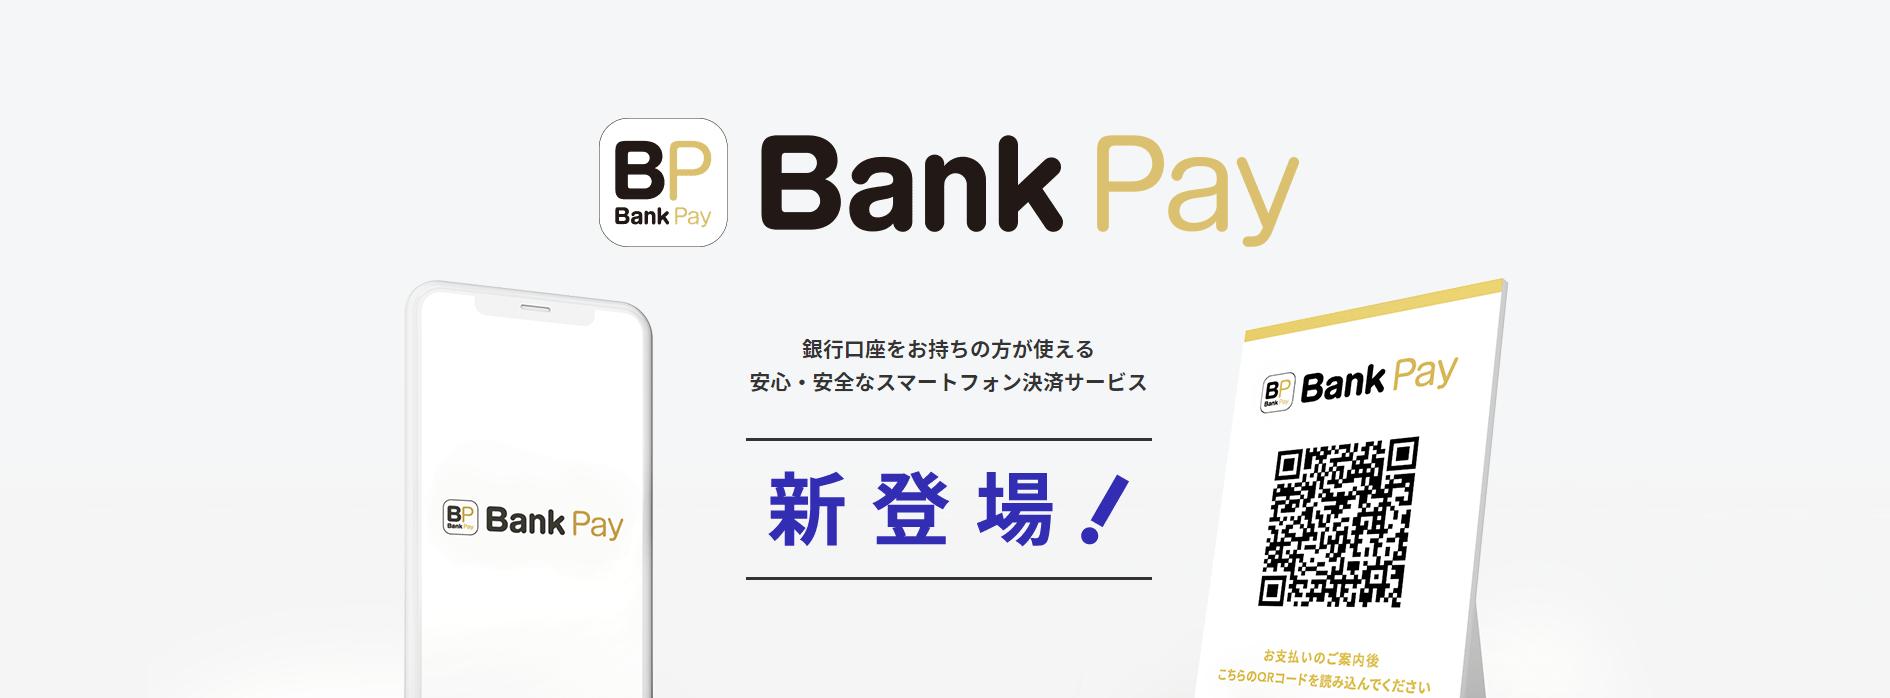 第 四 銀行 金融 機関 コード